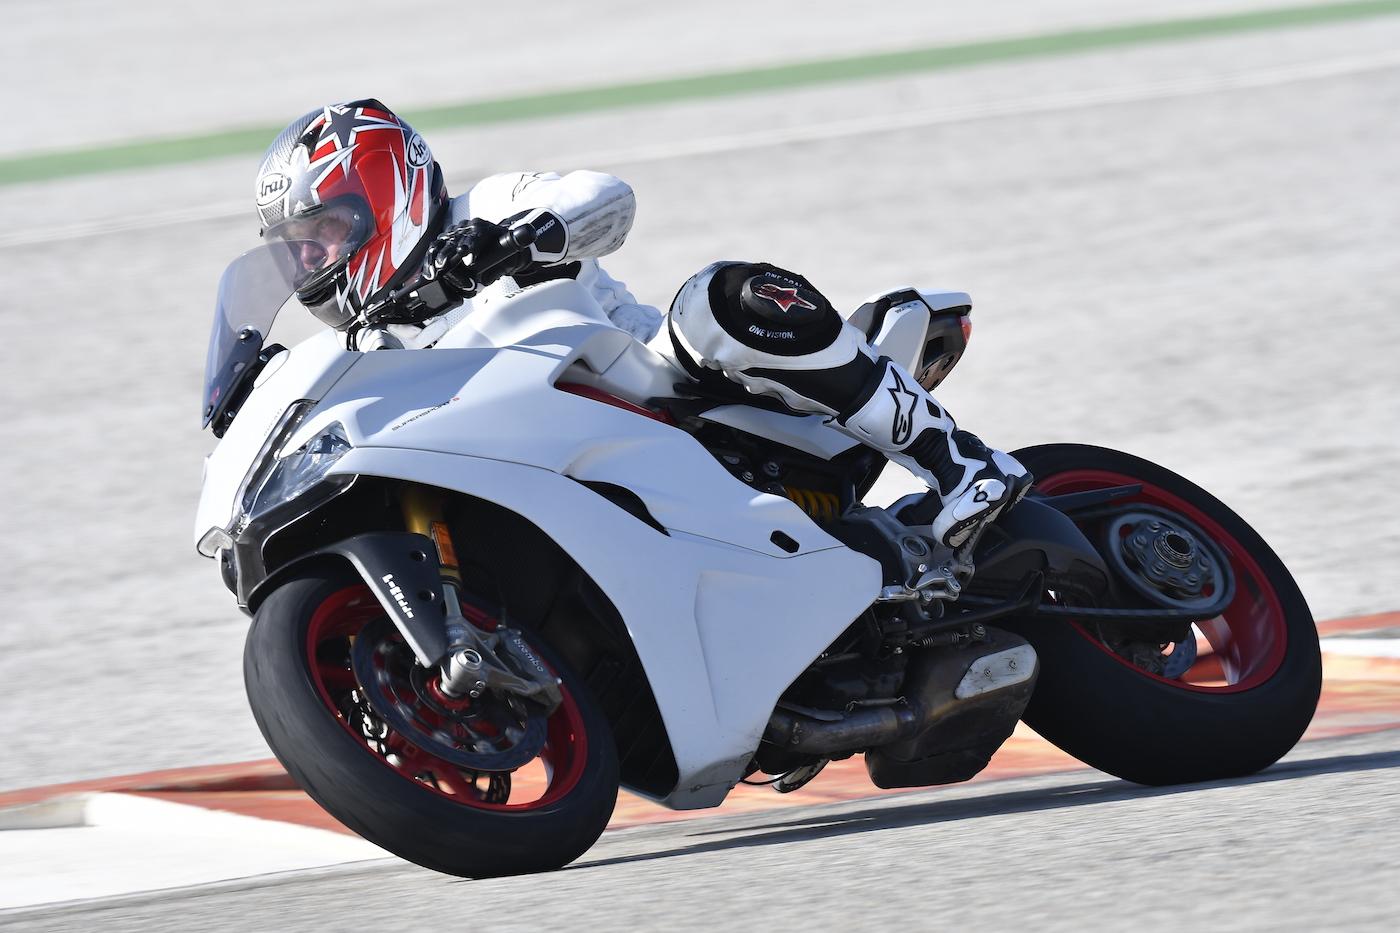 Ducati_Supersport_S_smalltrack2